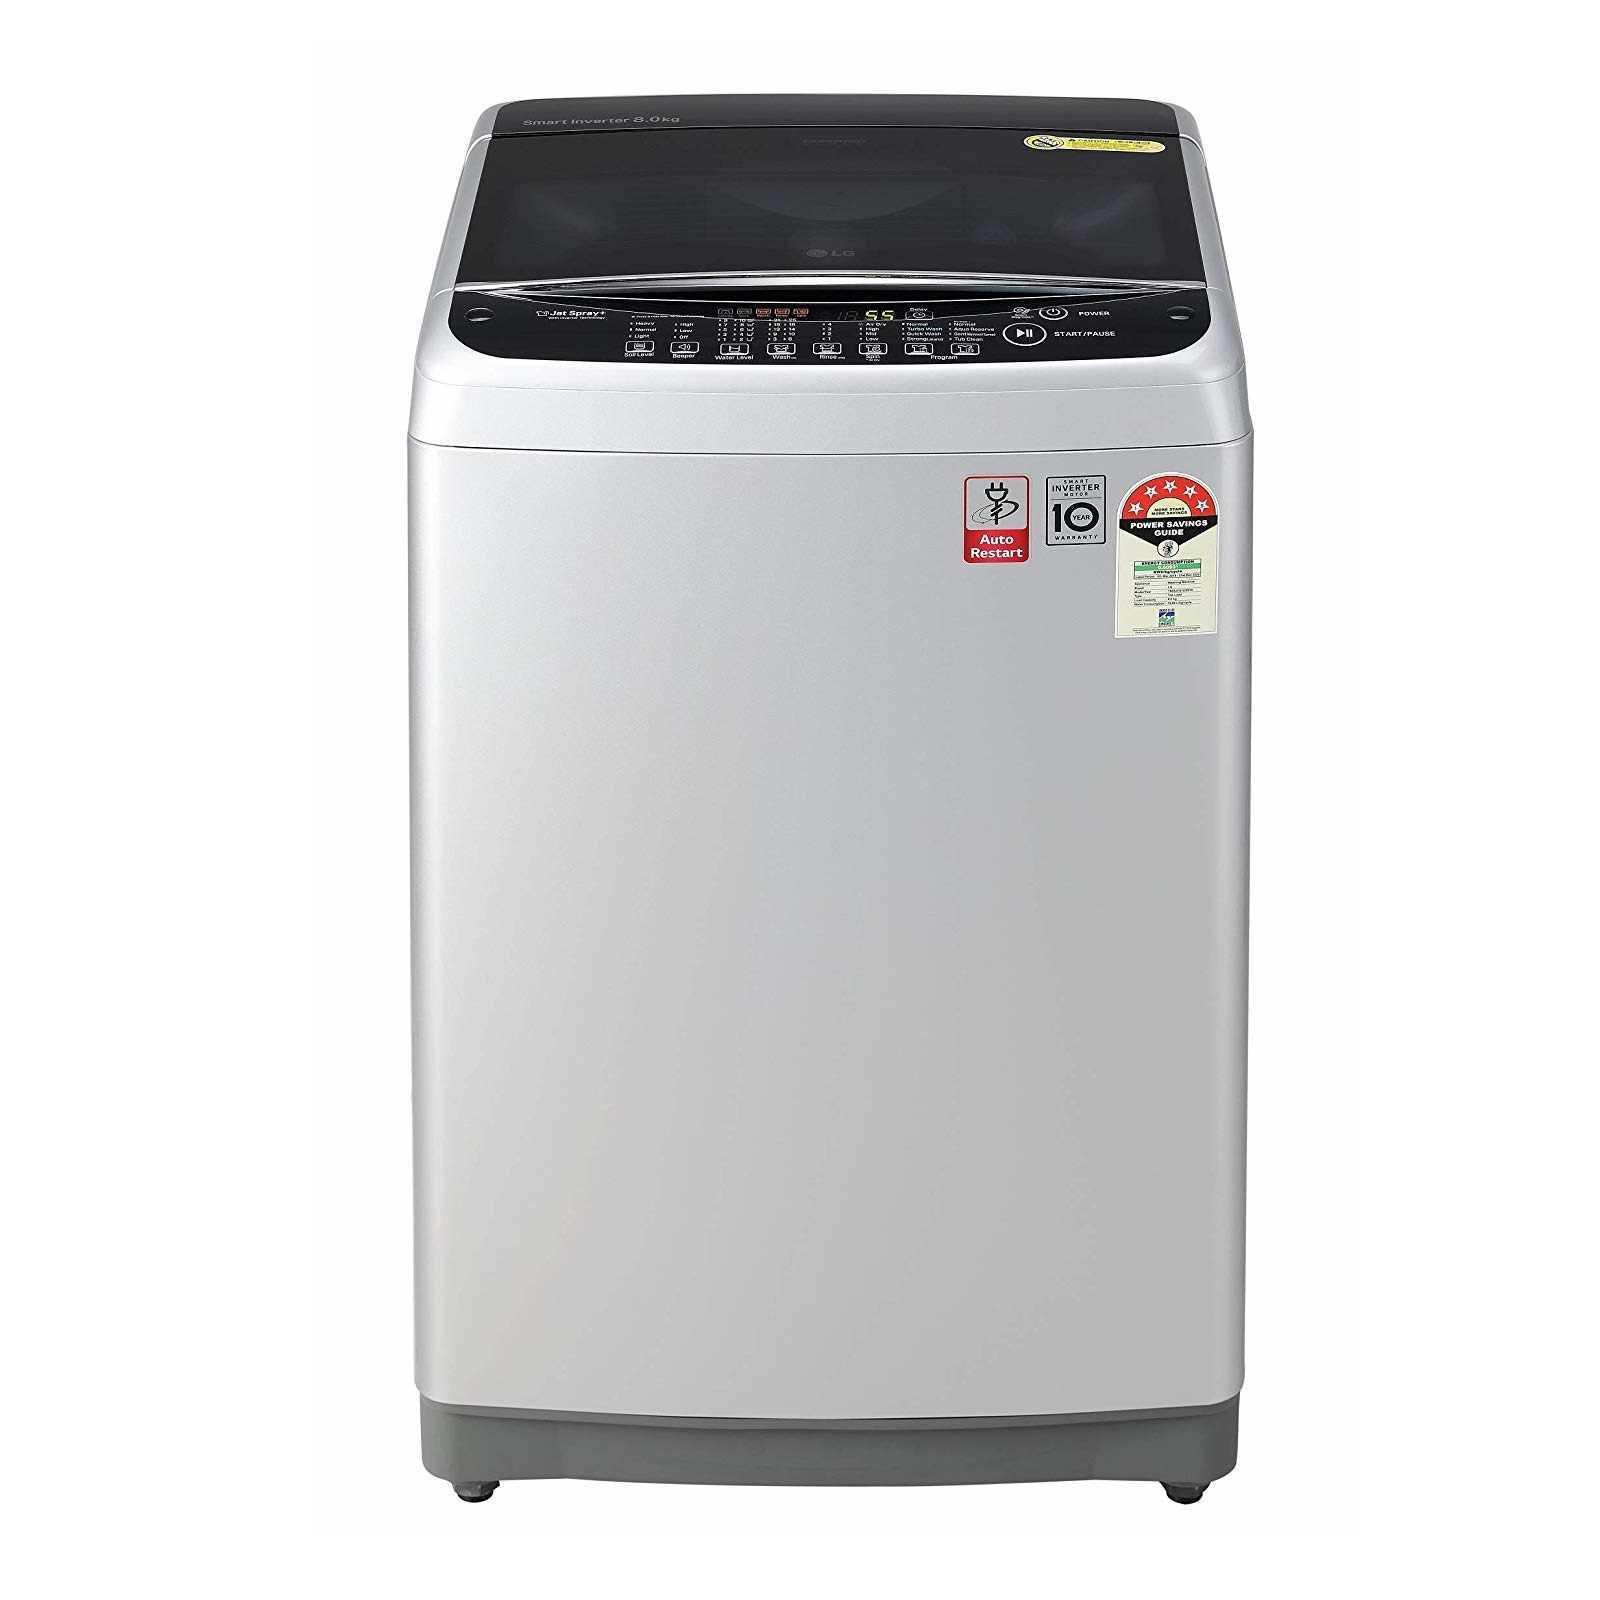 LG T80SJFS1Z 8 Kg Fully Automatic Top Loading Washing Machine